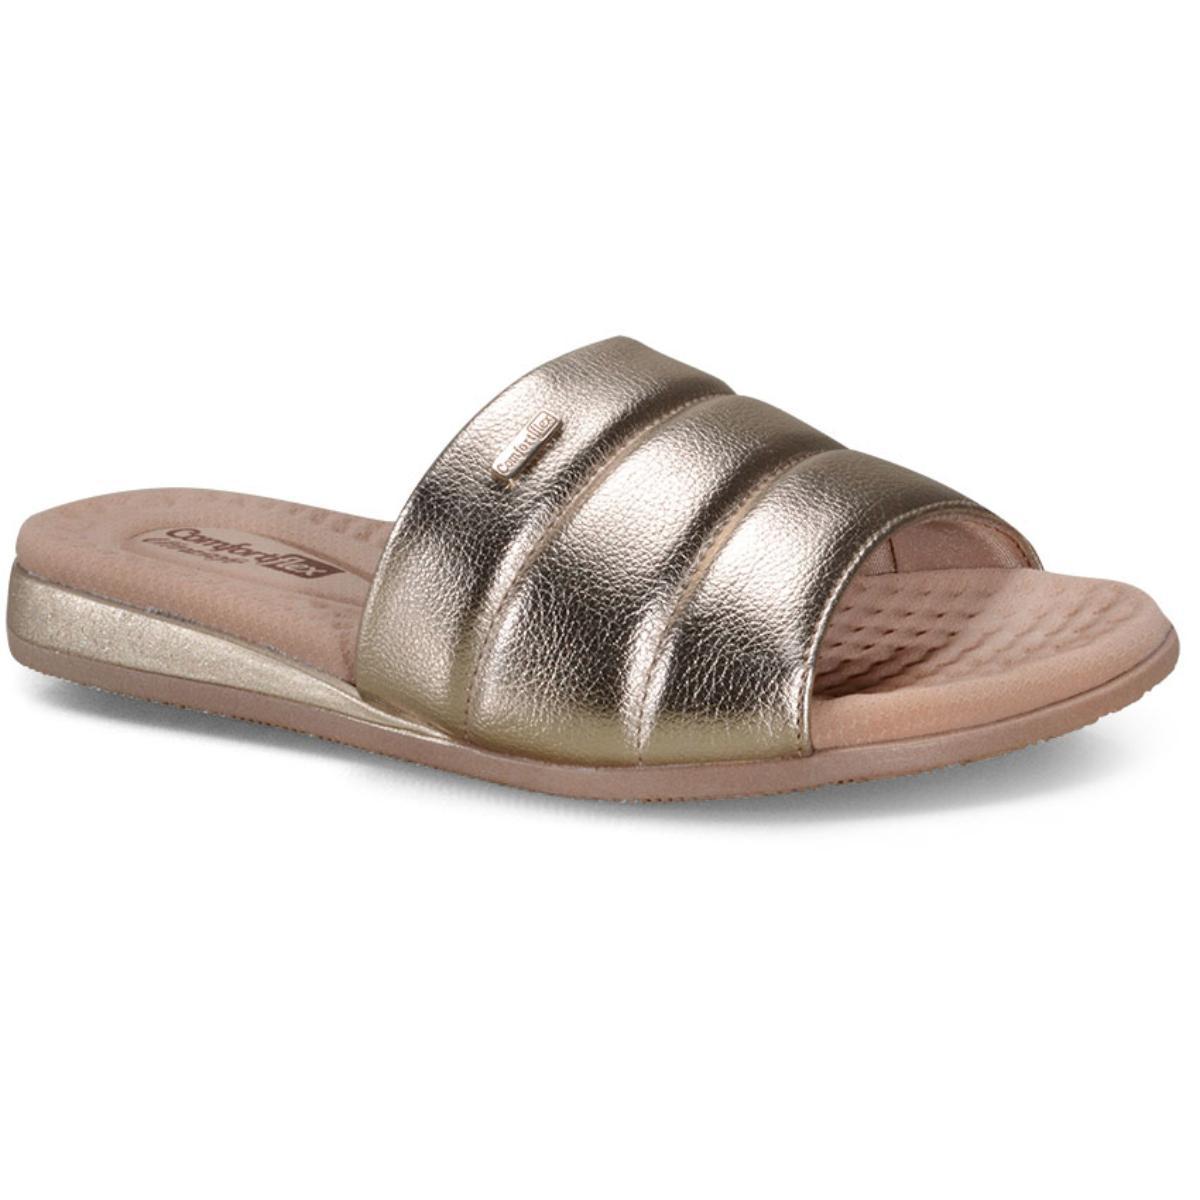 Tamanco Feminino Comfortflex 20-44402 Nude/ouro